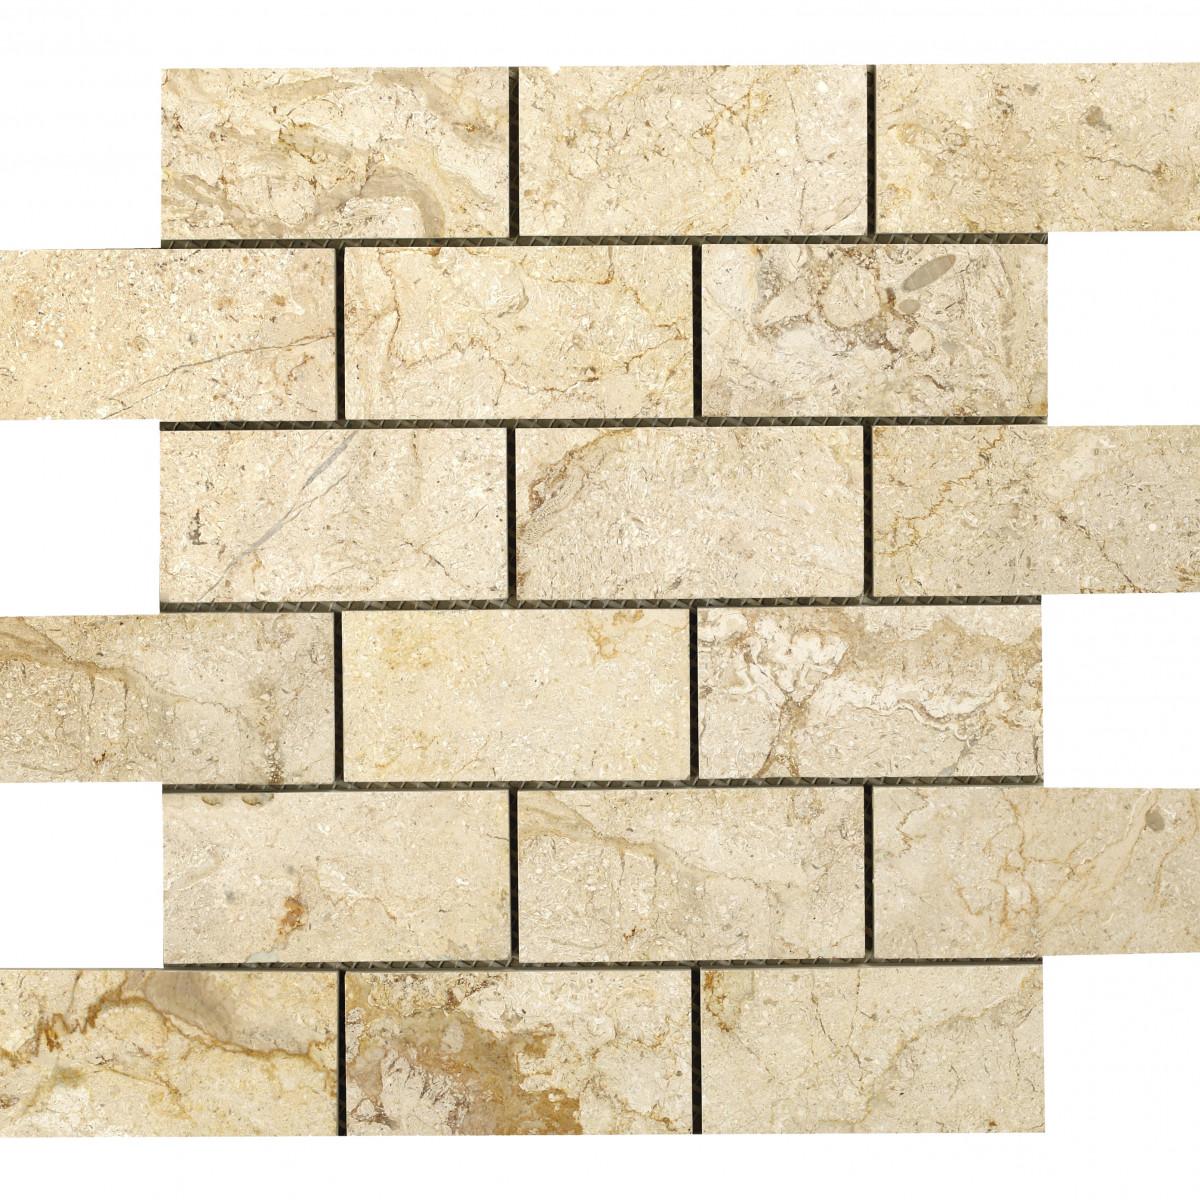 Bathroom Tiles for Walls & Floors | British Ceramic Tile